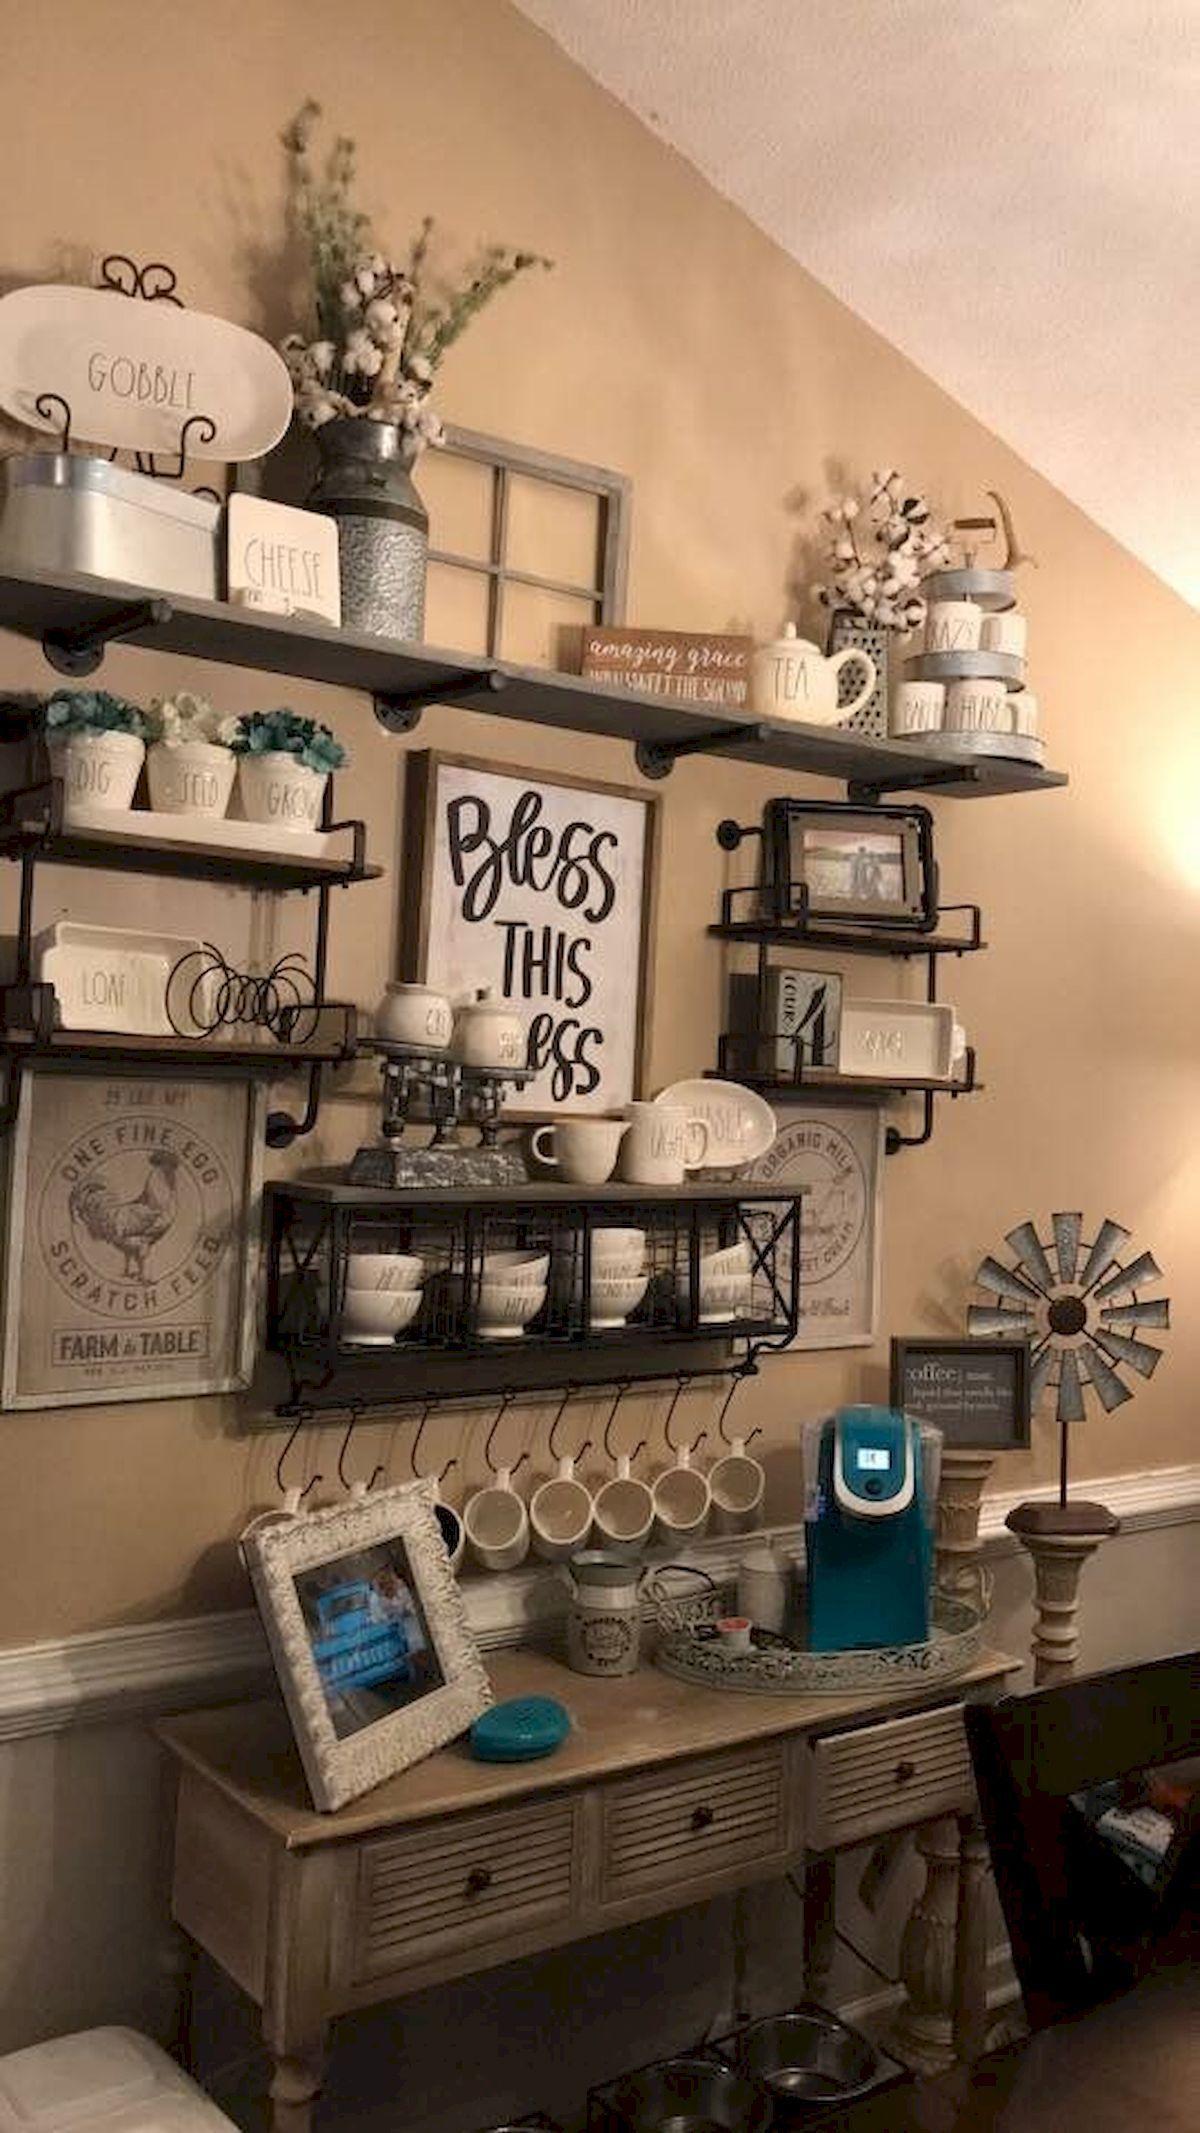 25 Best Farmhouse Master Bedroom Decor Ideas: 25 Best Farmhouse Small Apartment Decor Ideas (2 In 2019